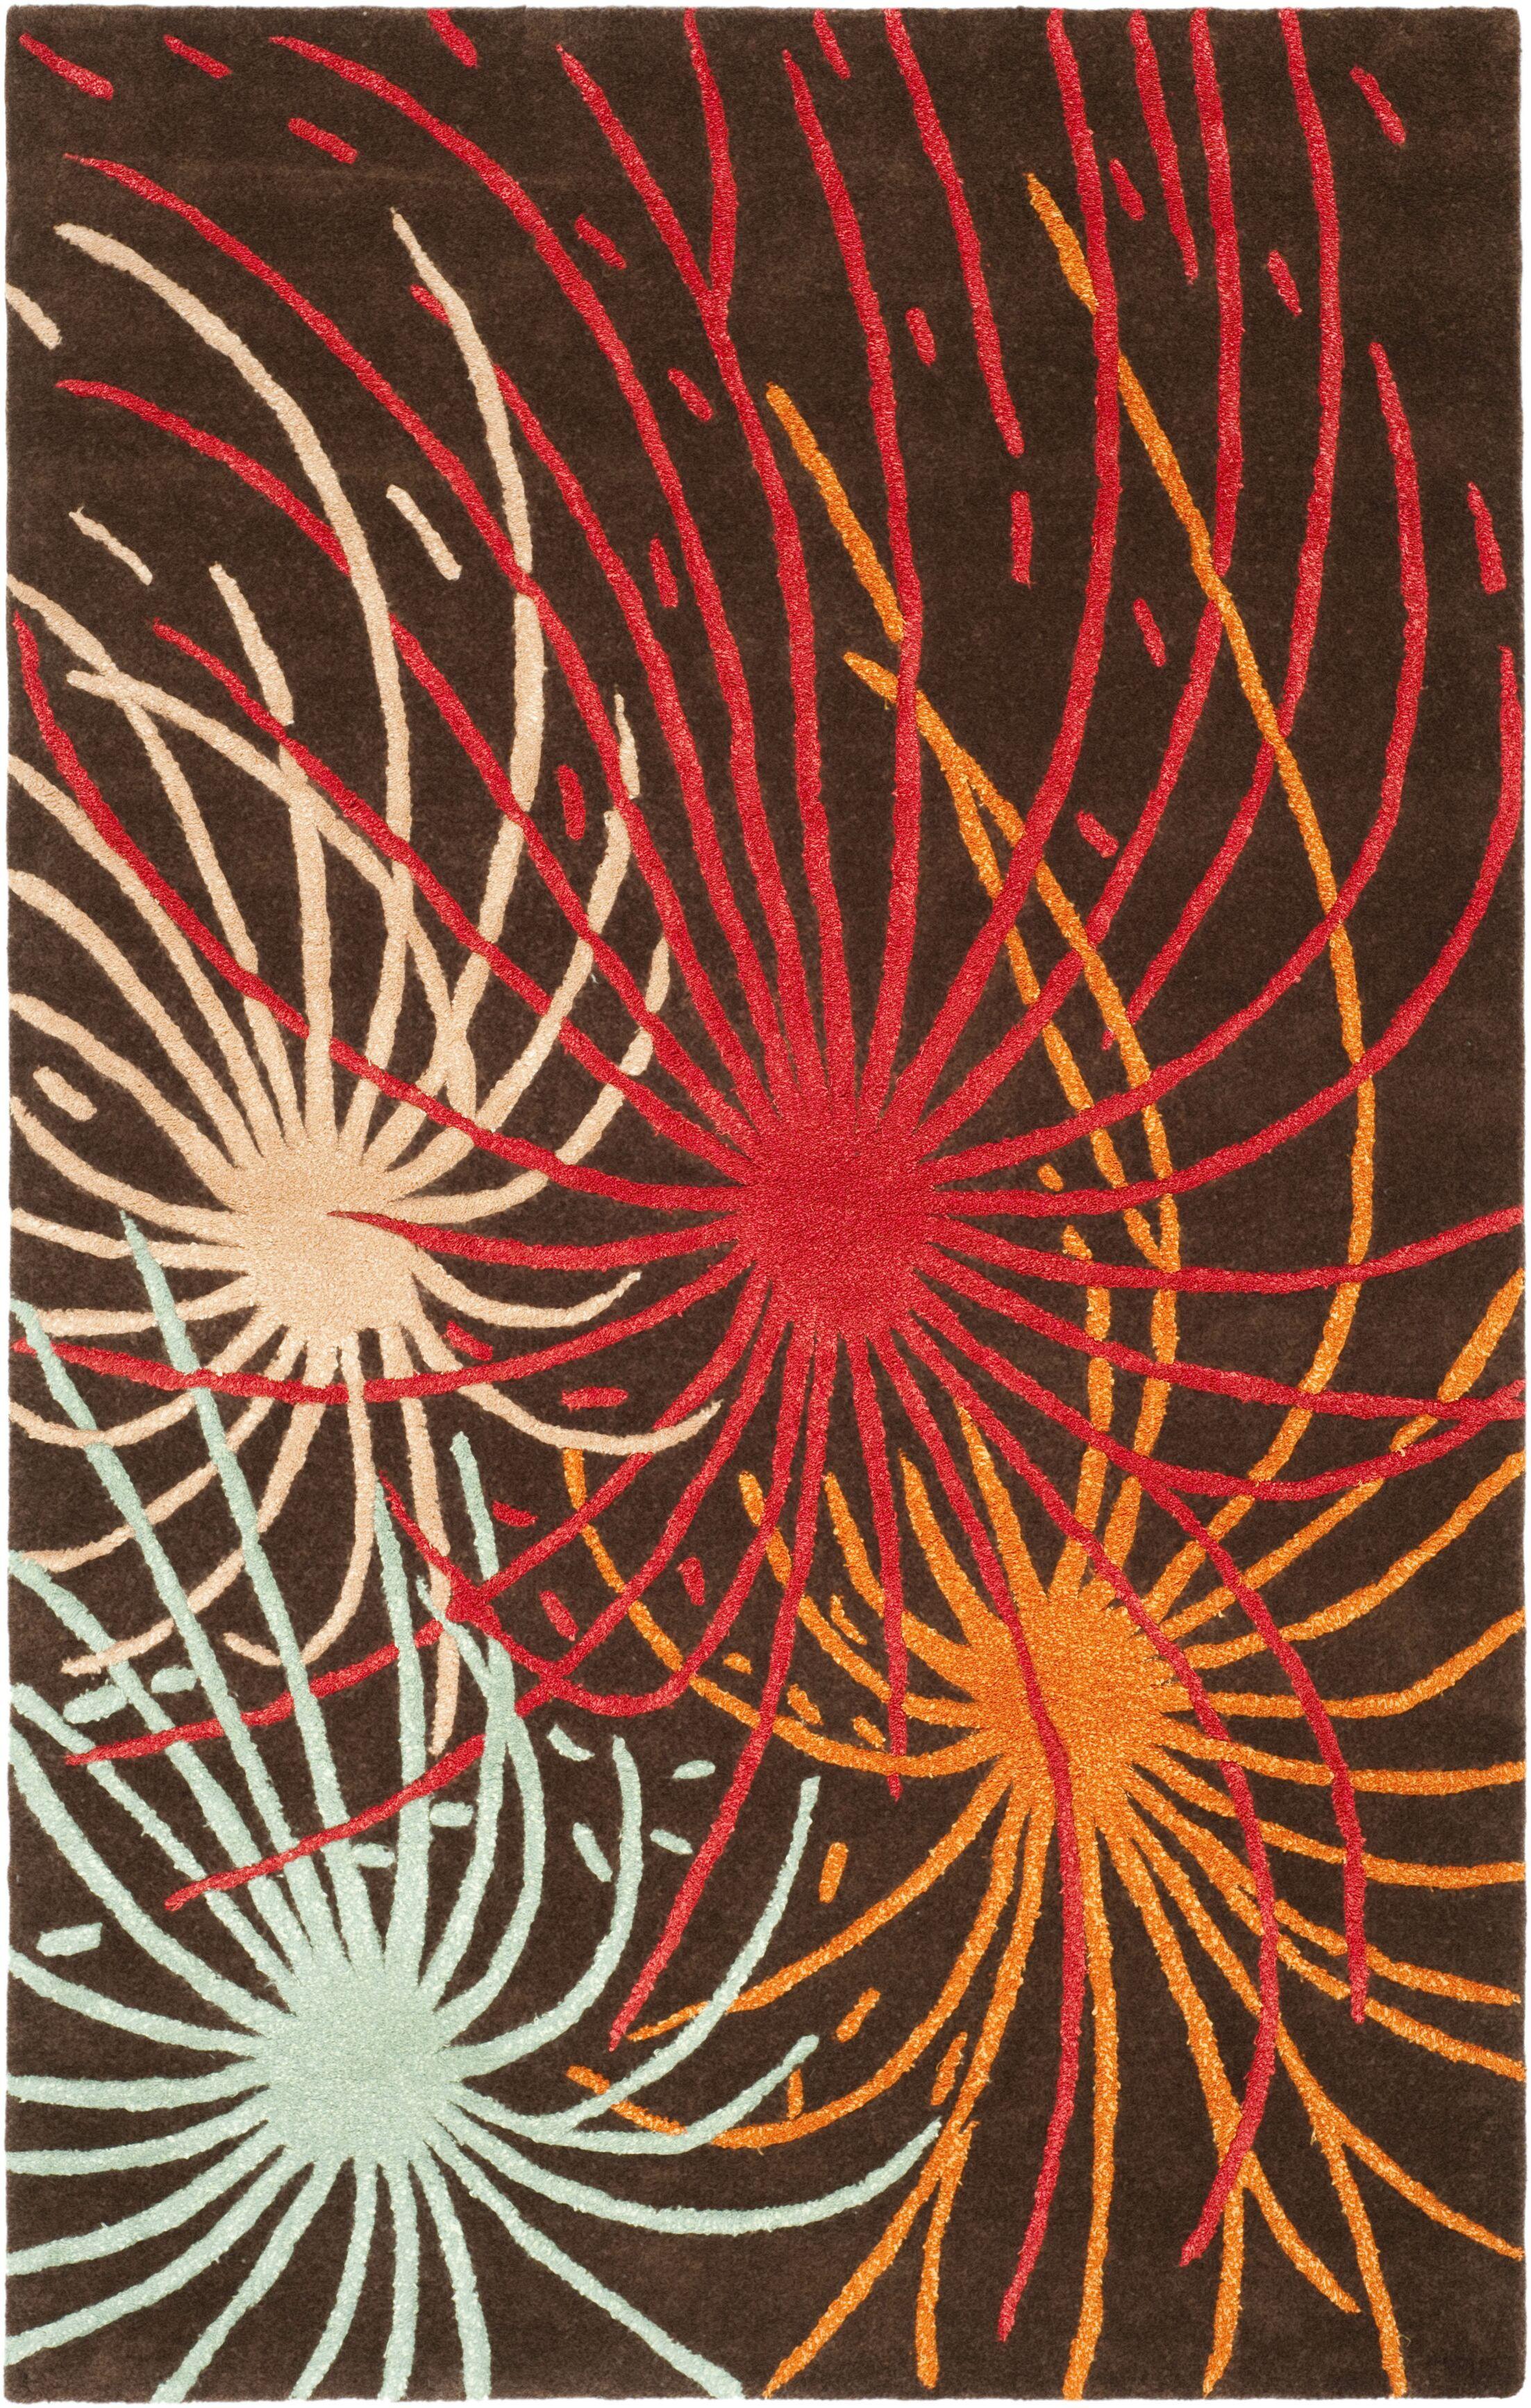 Lockwood Light Brown Area Rug Rug Size: Rectangle 5' x 8'